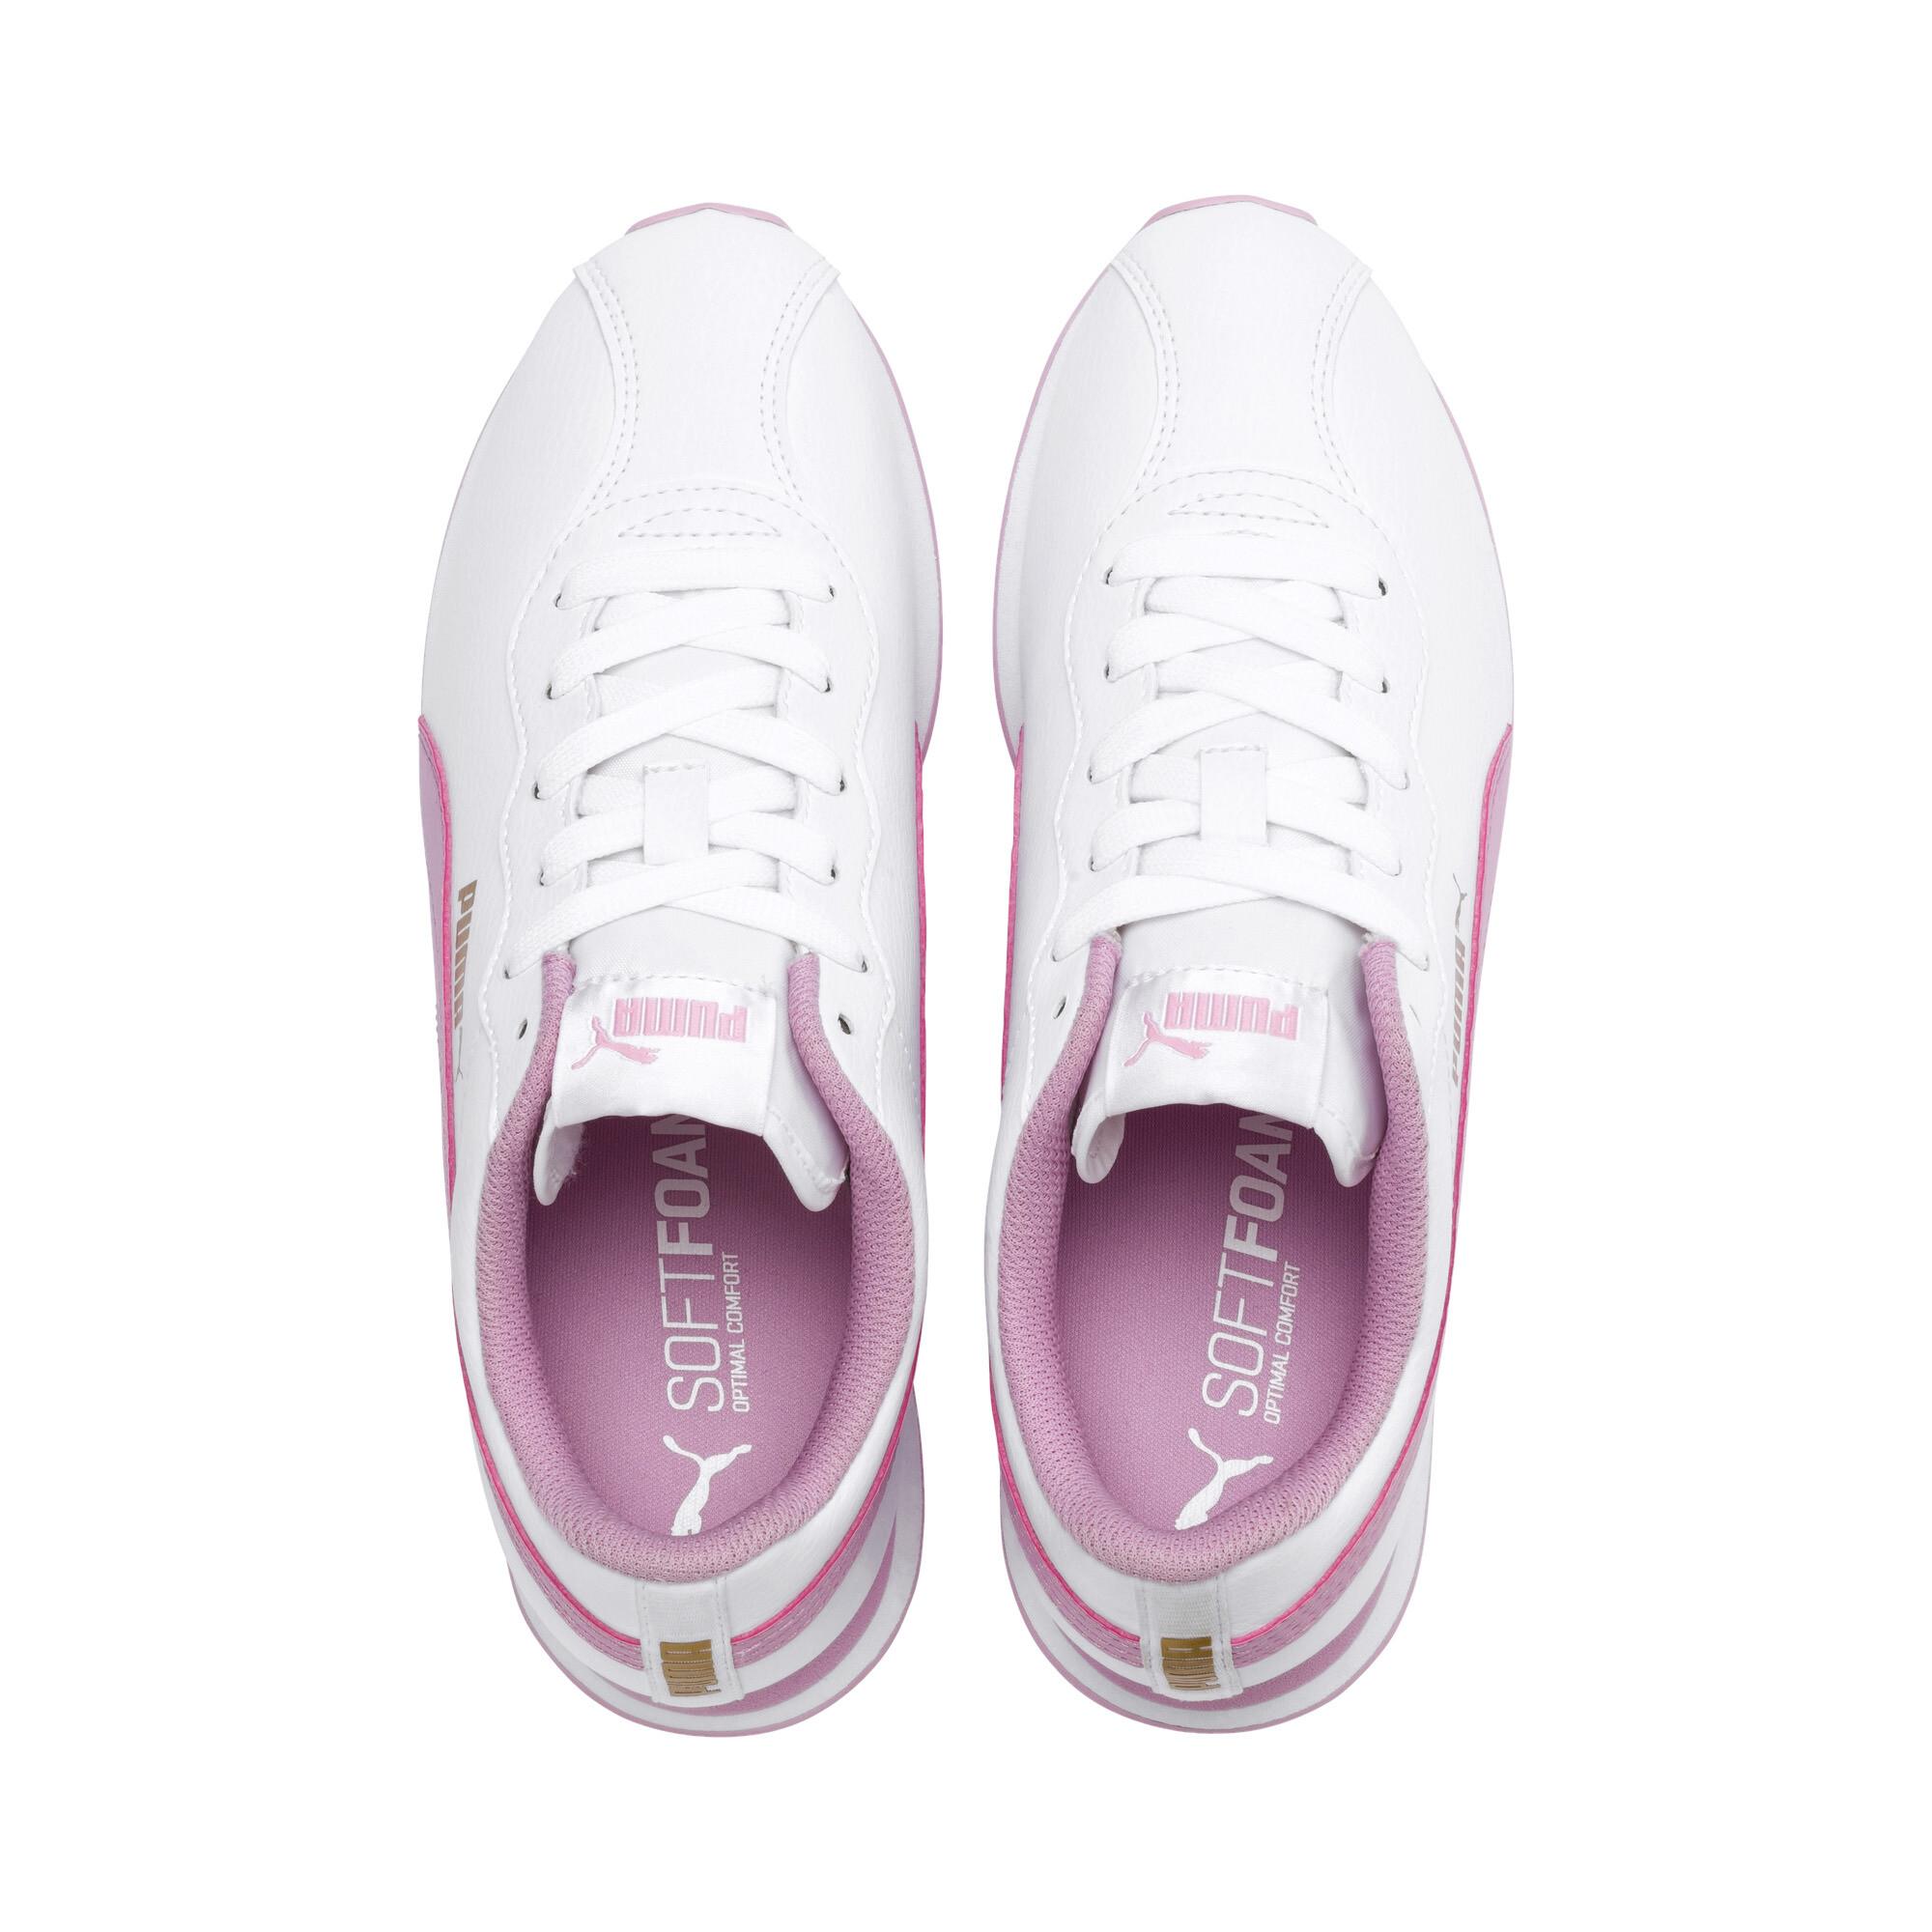 PUMA-Men-039-s-Turin-II-Sneakers thumbnail 29